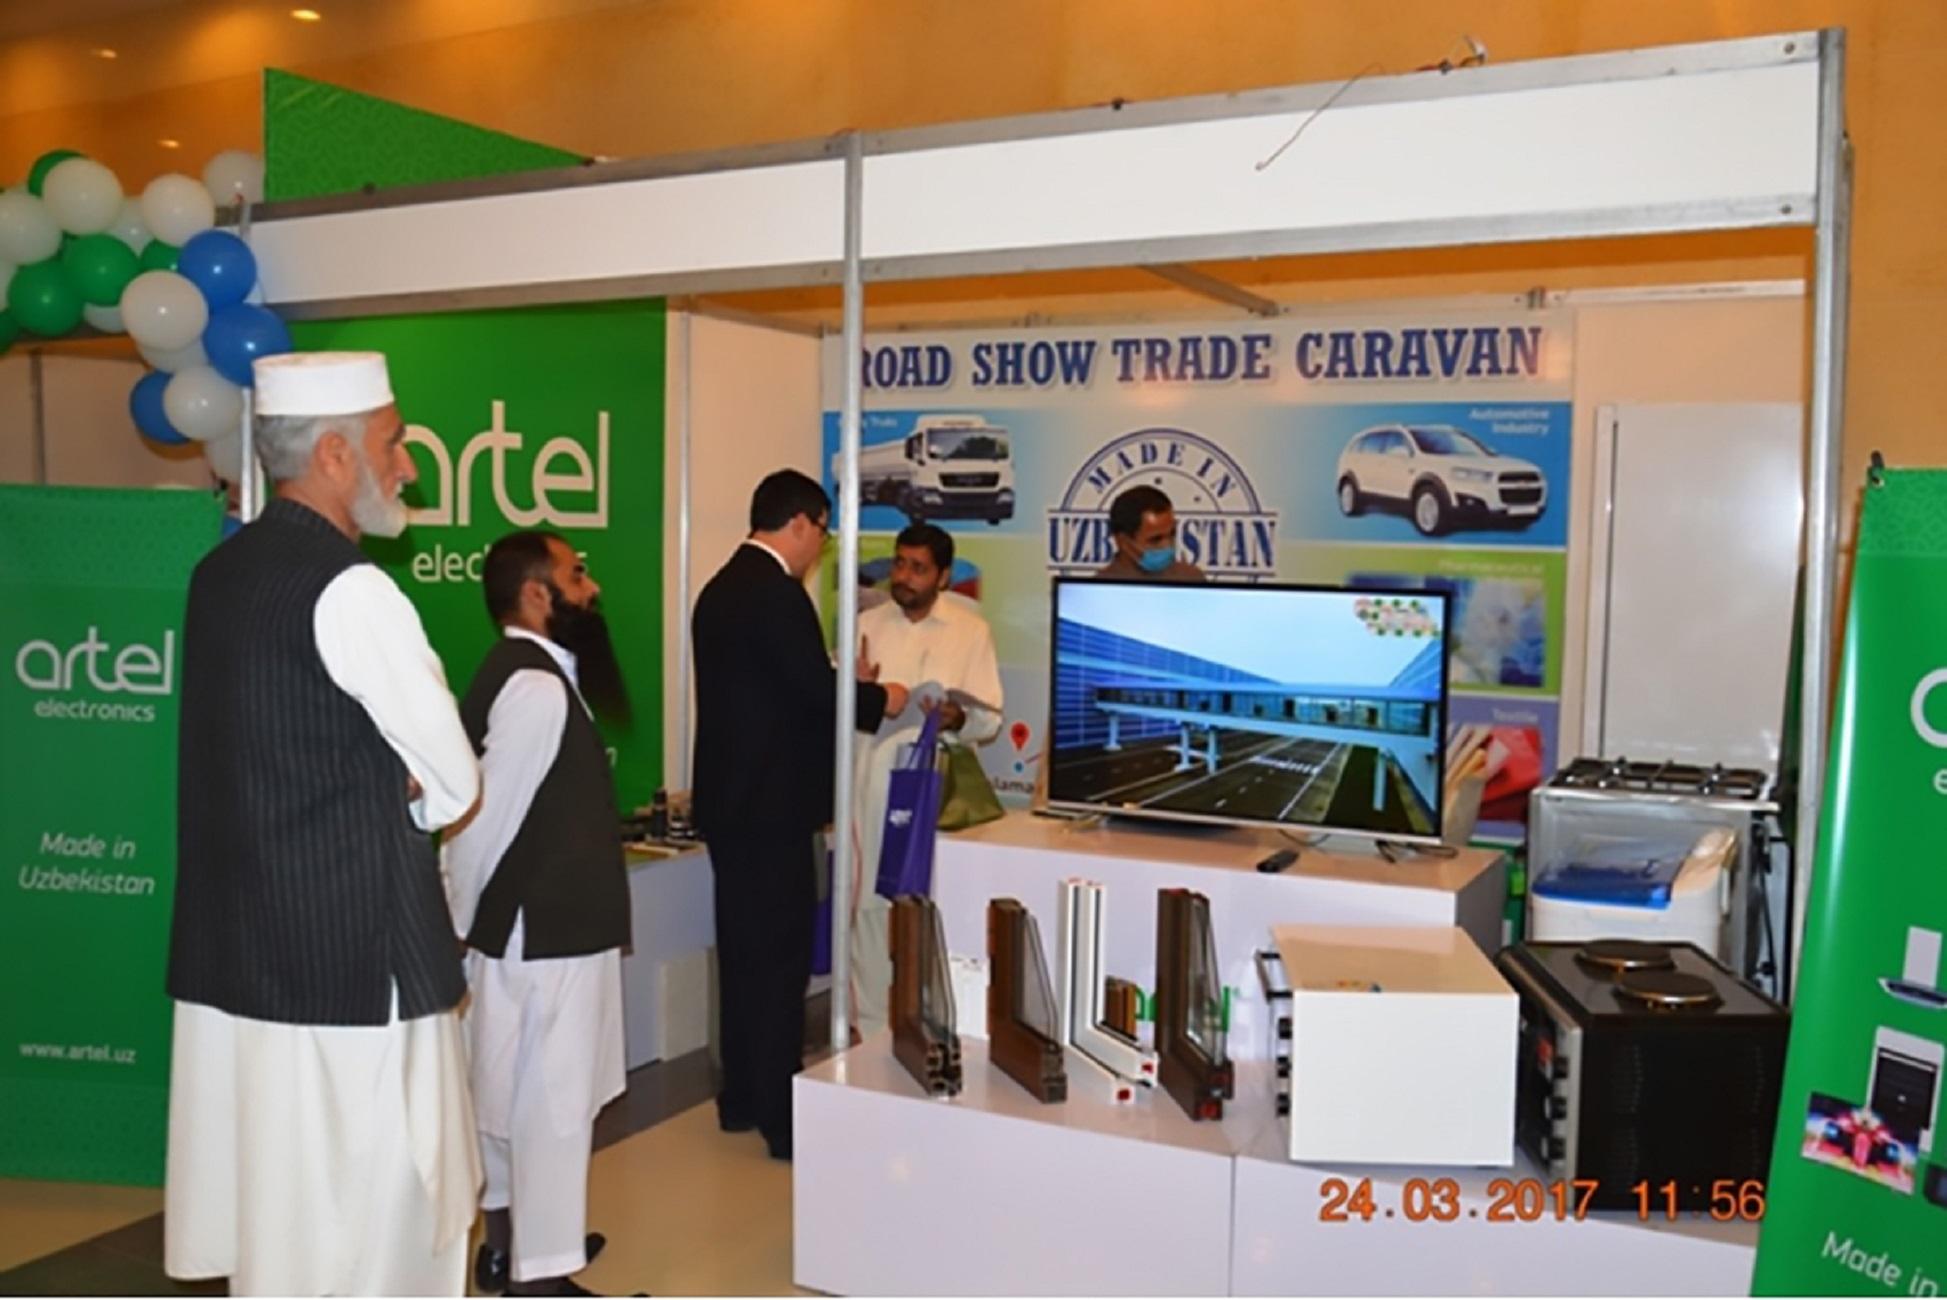 "Узбекские предприниматели представили продукцию на выставке ""Abad Jand Expo"" в Исламбаде 24-26 марта. [МИД Узбекистана]"